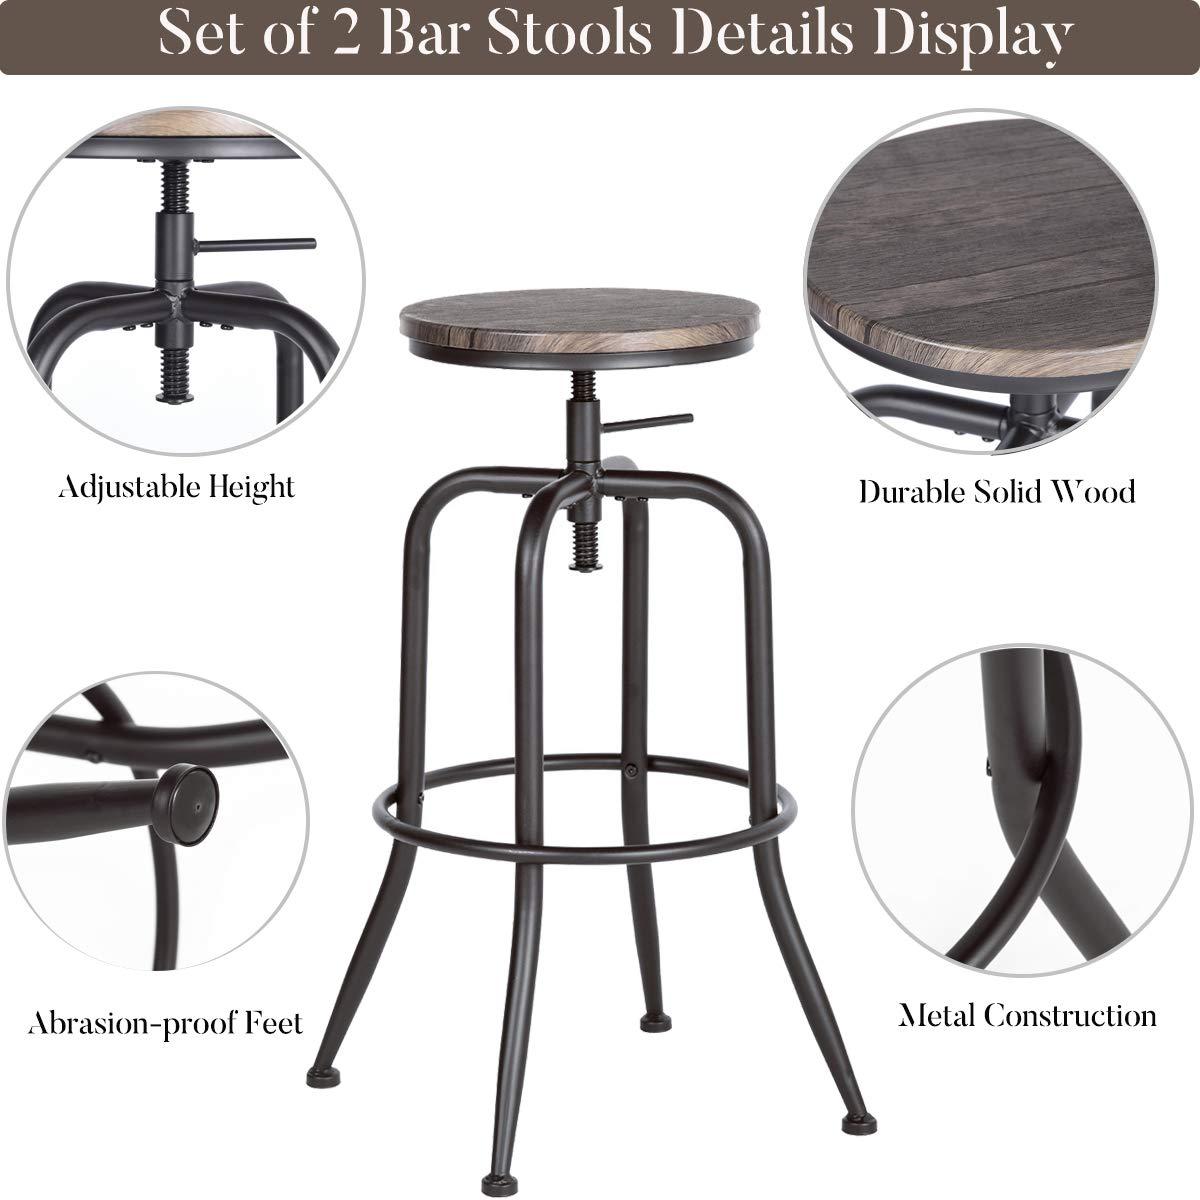 Aingoo Set of 2 Bar Stools Vintage Height Adjustable Wood Metal Design Industrial Bistro Pub Kitchen Counter Bar Stool Chair Brown